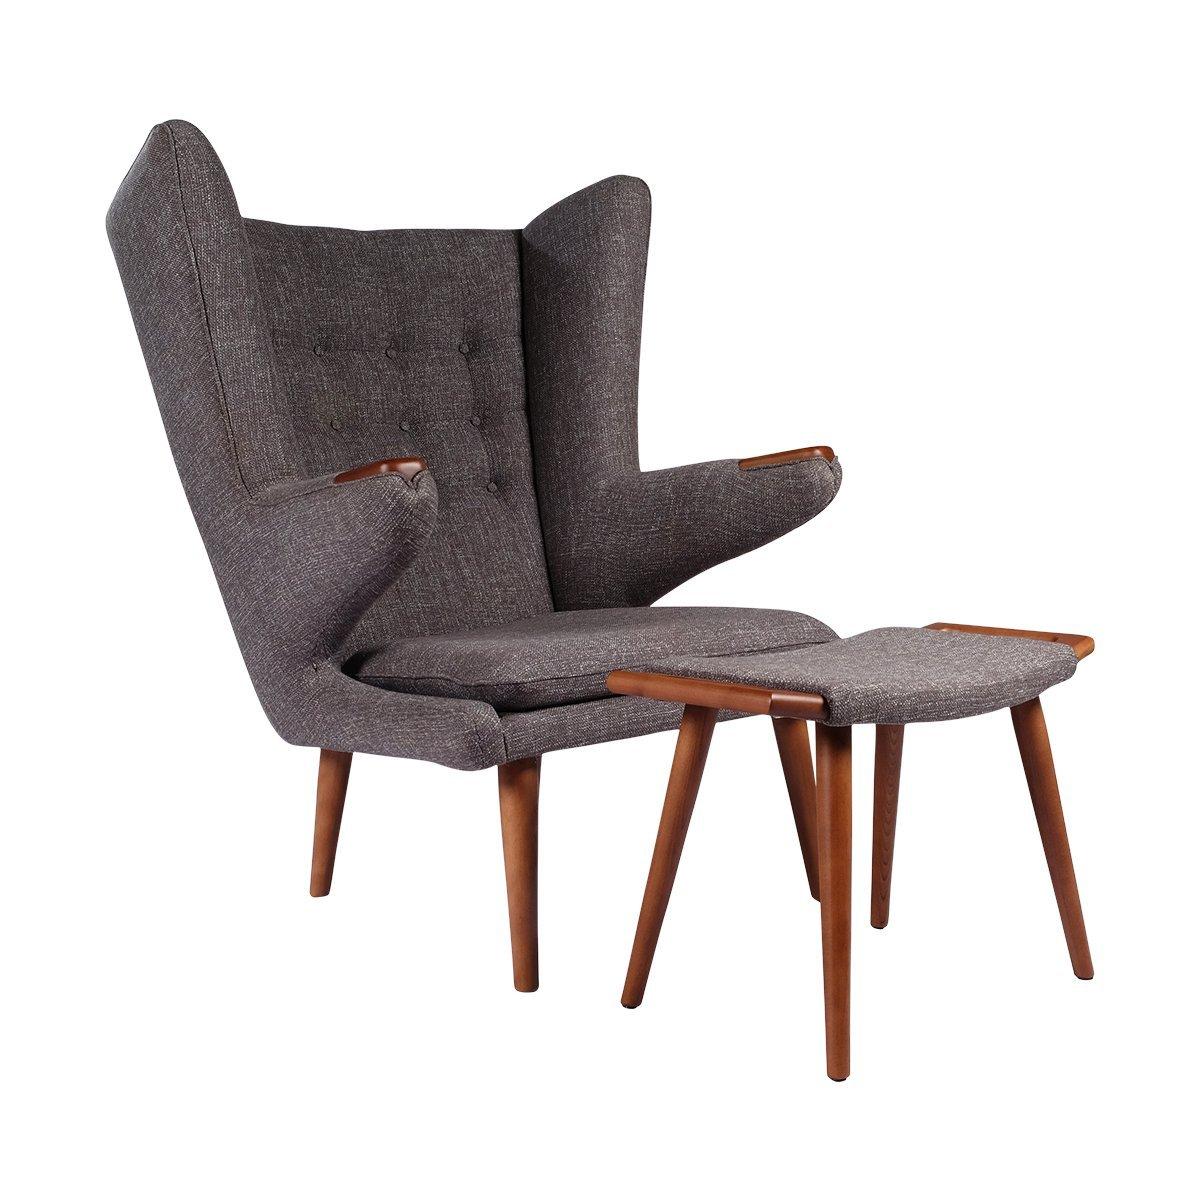 Exceptional Papa Bear Chair W/ Ottoman, Charcoal Grey Wegner Replica